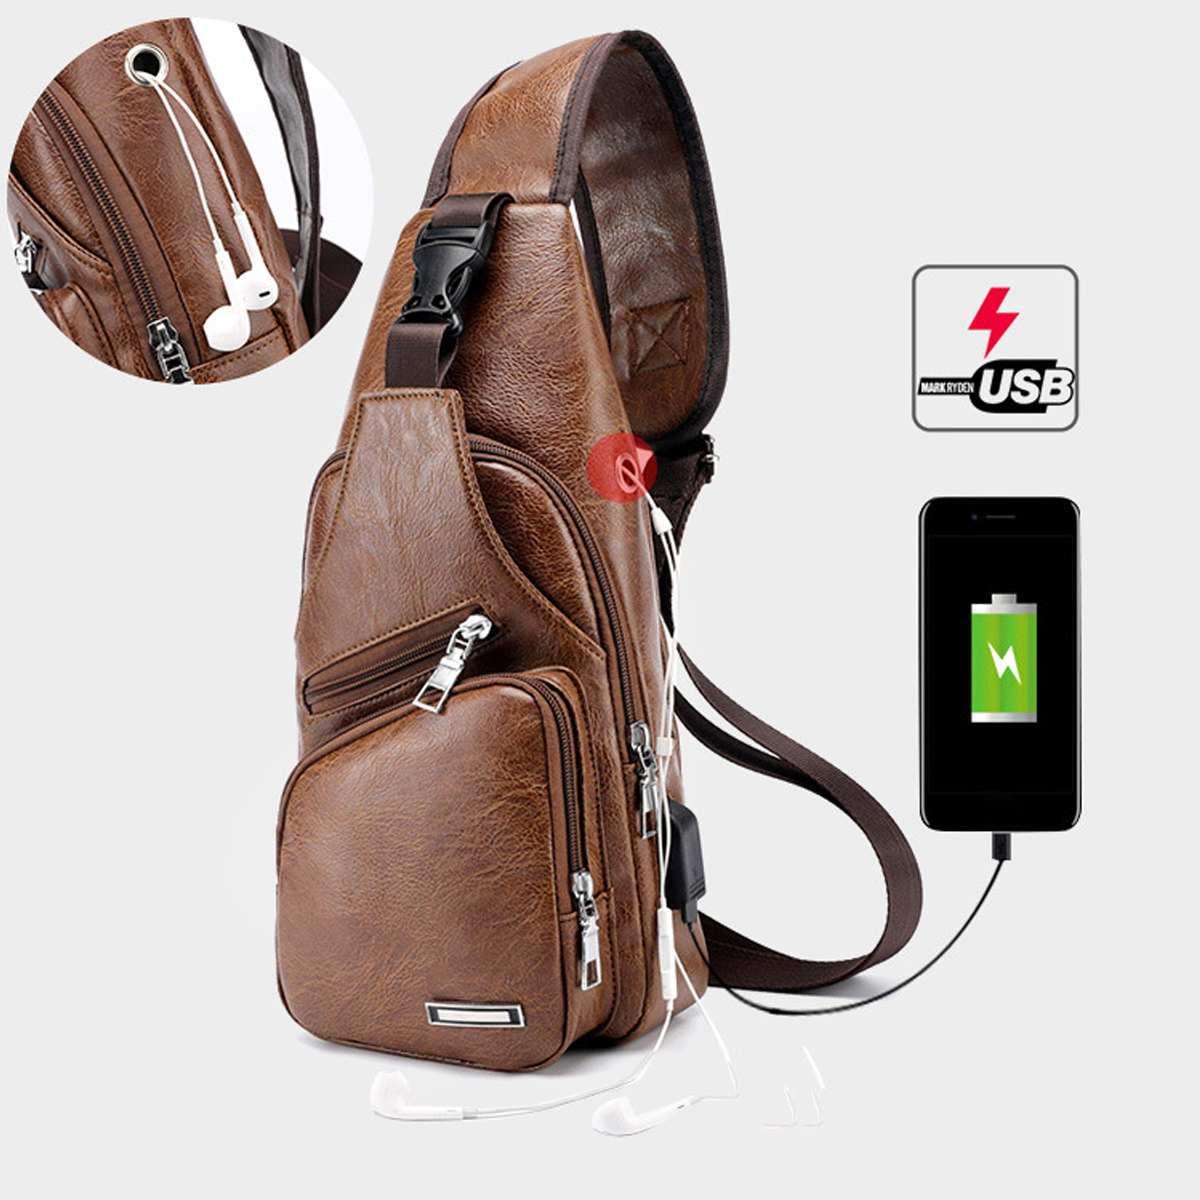 Men's Crossbody Bags Men's USB Chest Bag Designer Messenger Bag Leather Shoulder Bags Diagonal Package NEW Backpack Travel